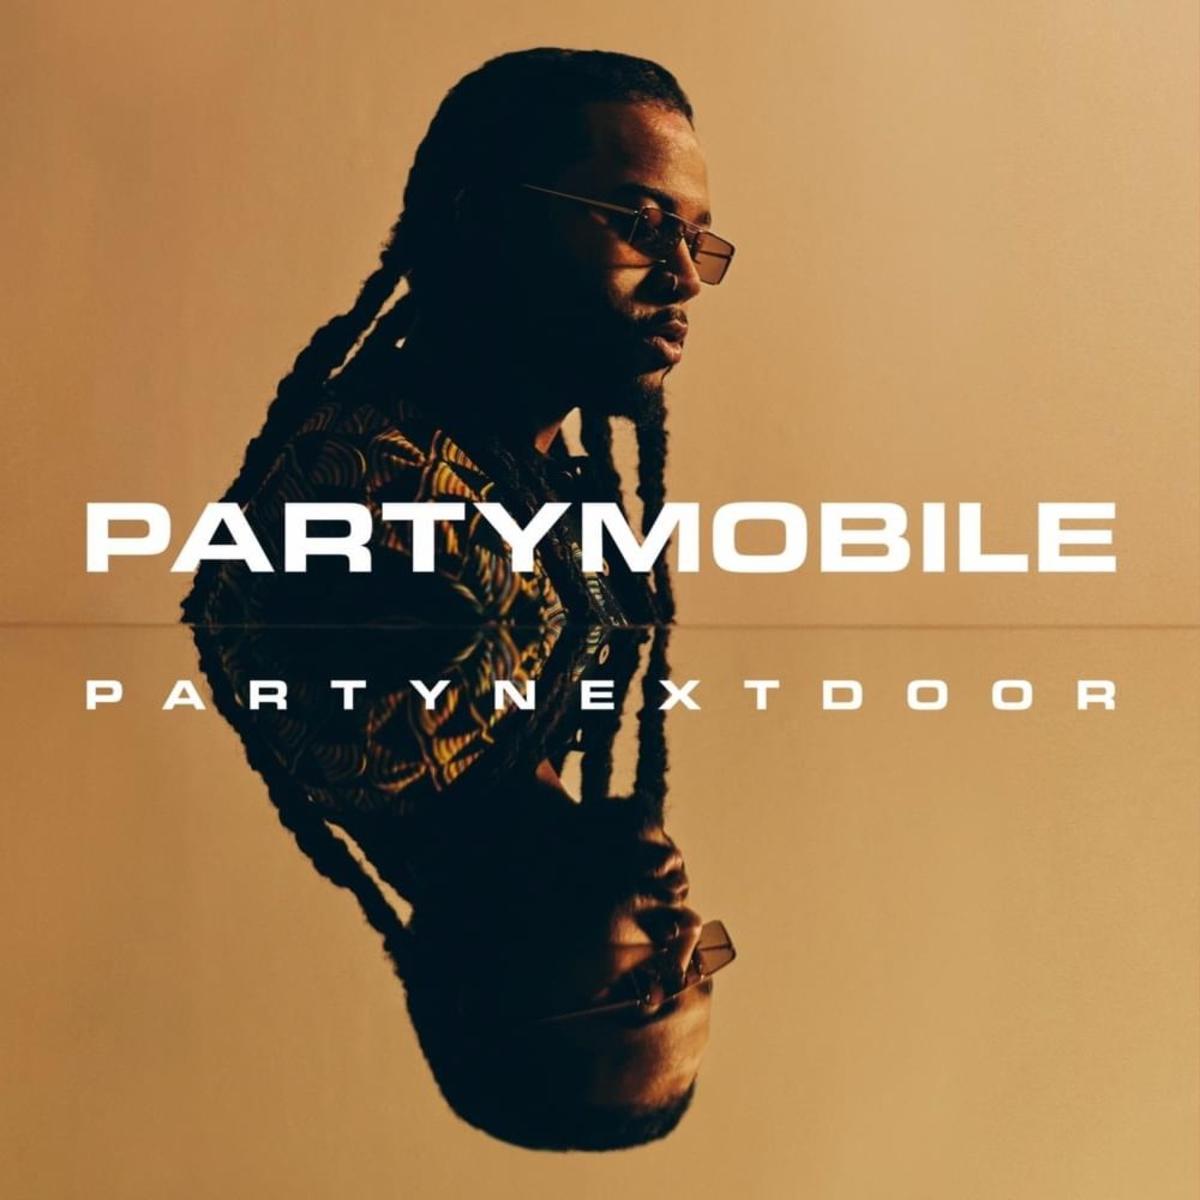 PartyNextDoor Shares 'Partymobile' Album